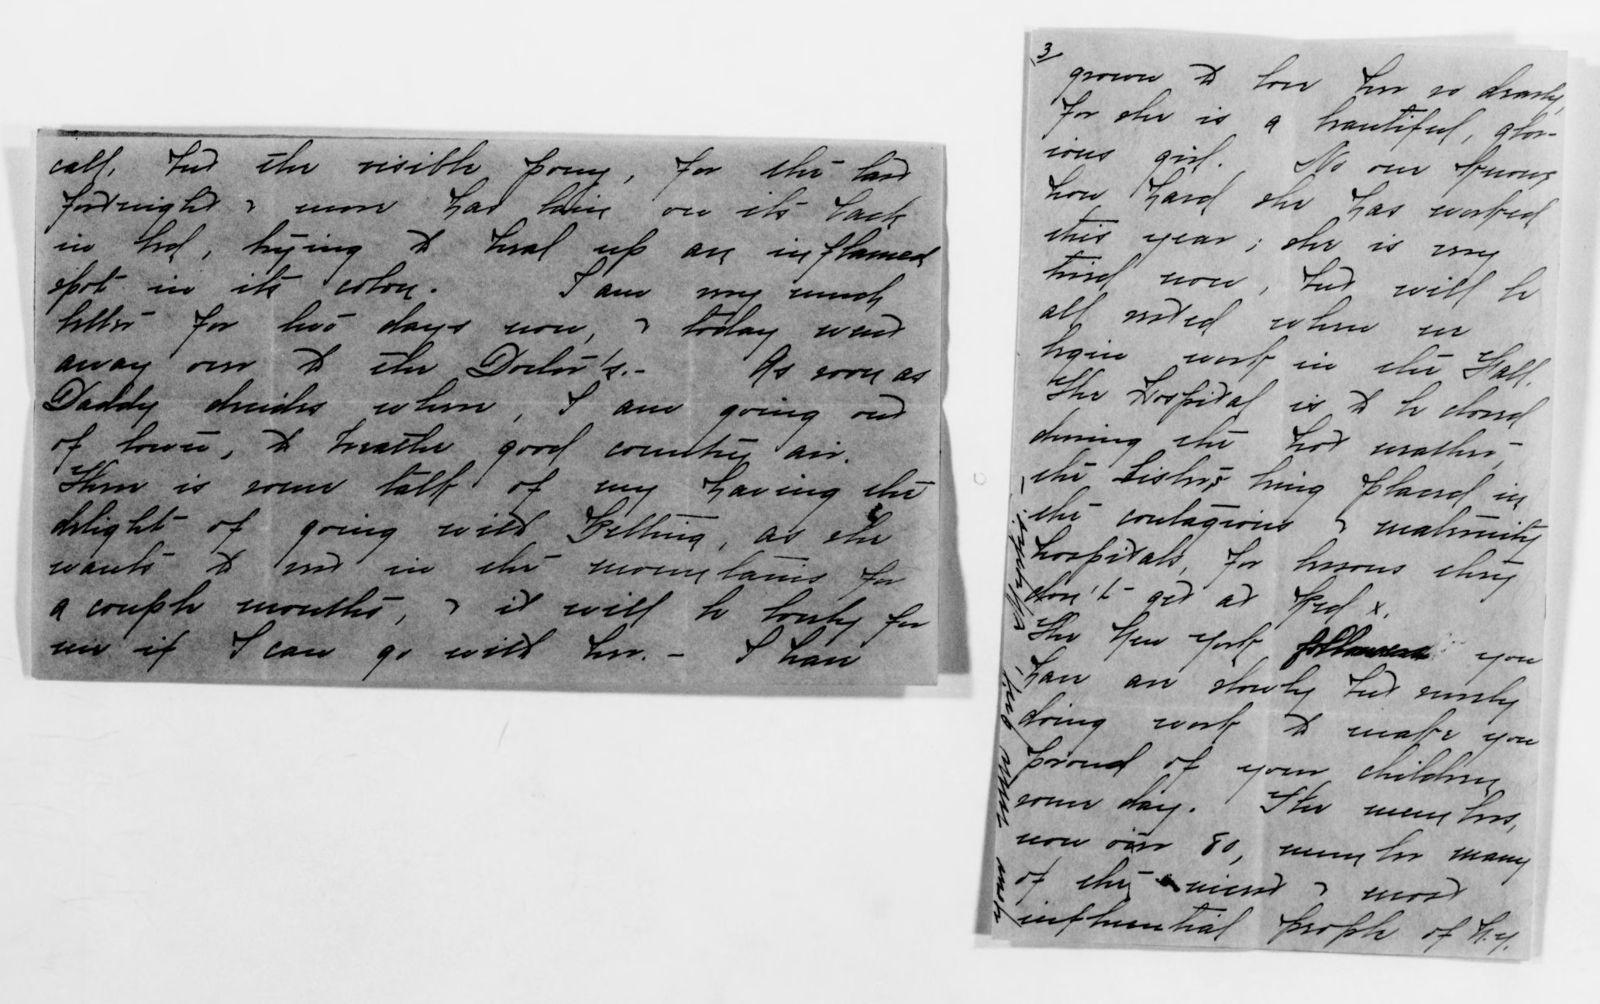 Clara Barton Papers: Family Papers: Butler, Myrtis Barton (grandniece), 1888-1941, undated